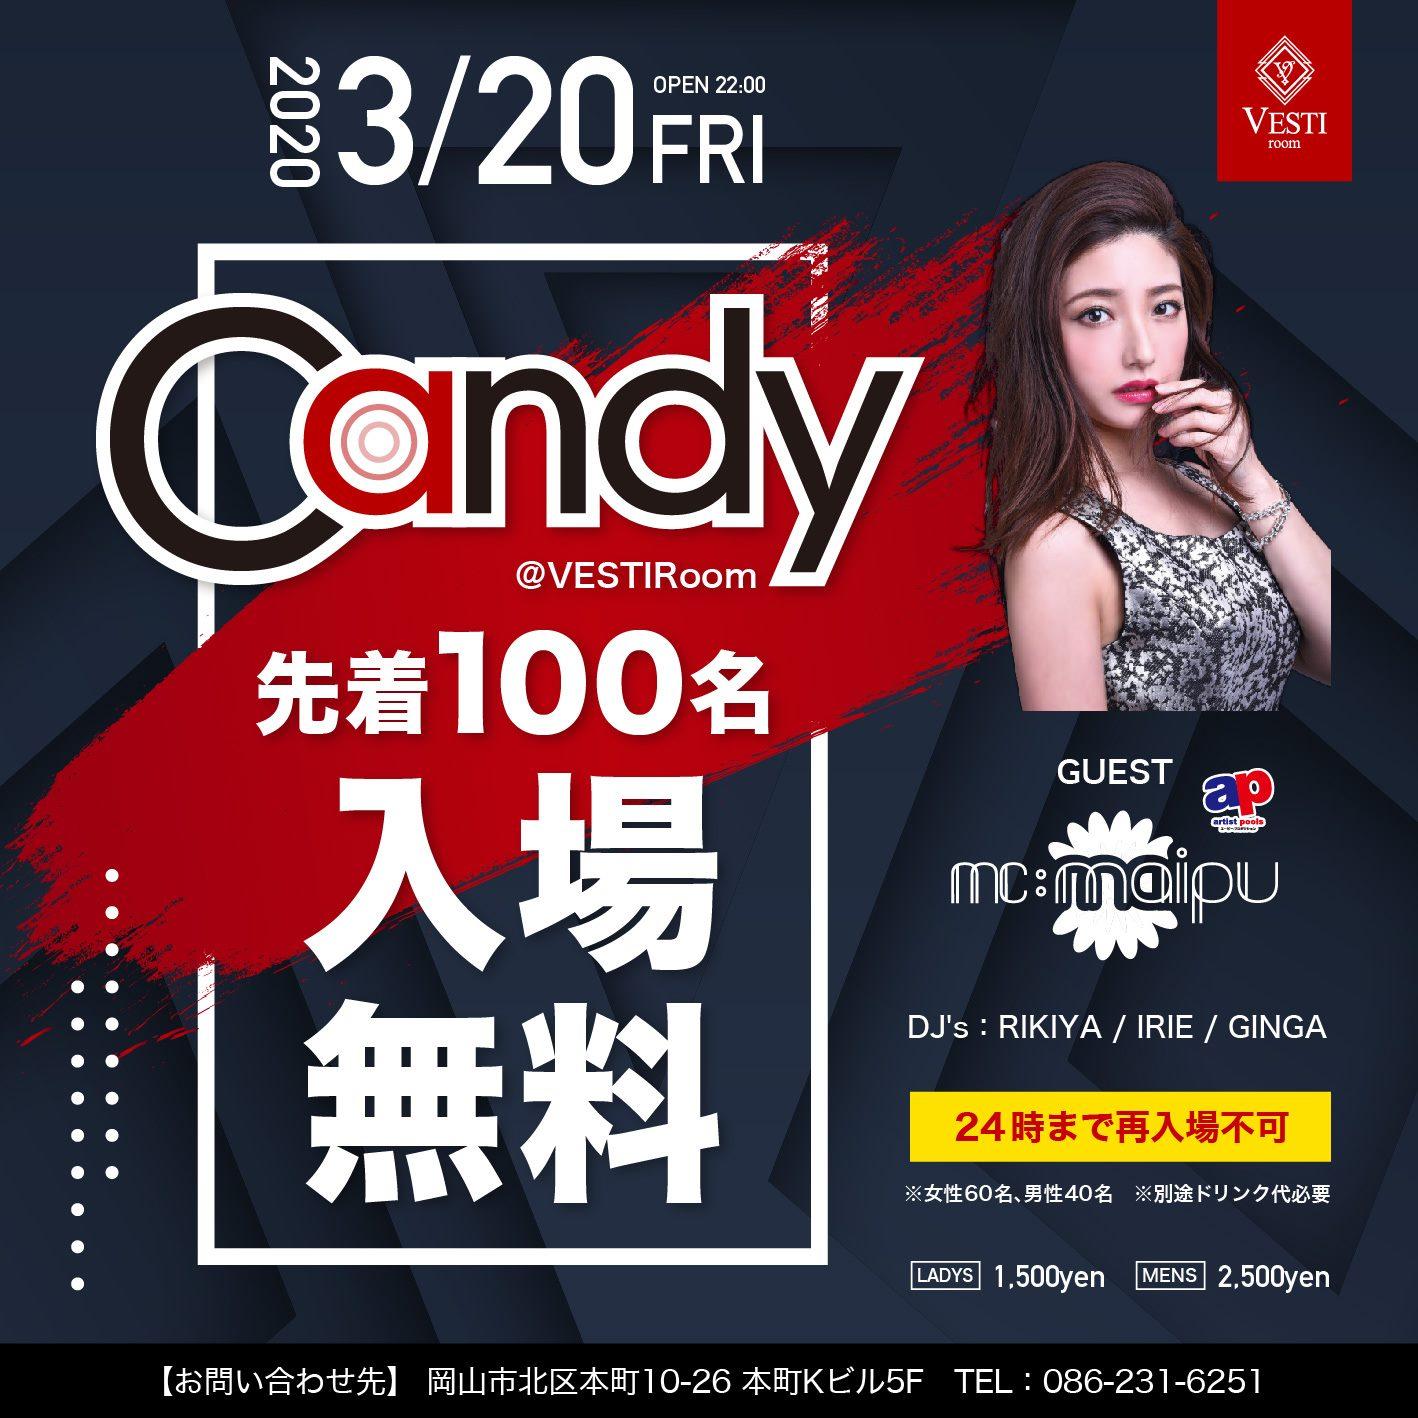 CANDY ~Guest : MC MAIPU~ 先着100名様入場無料